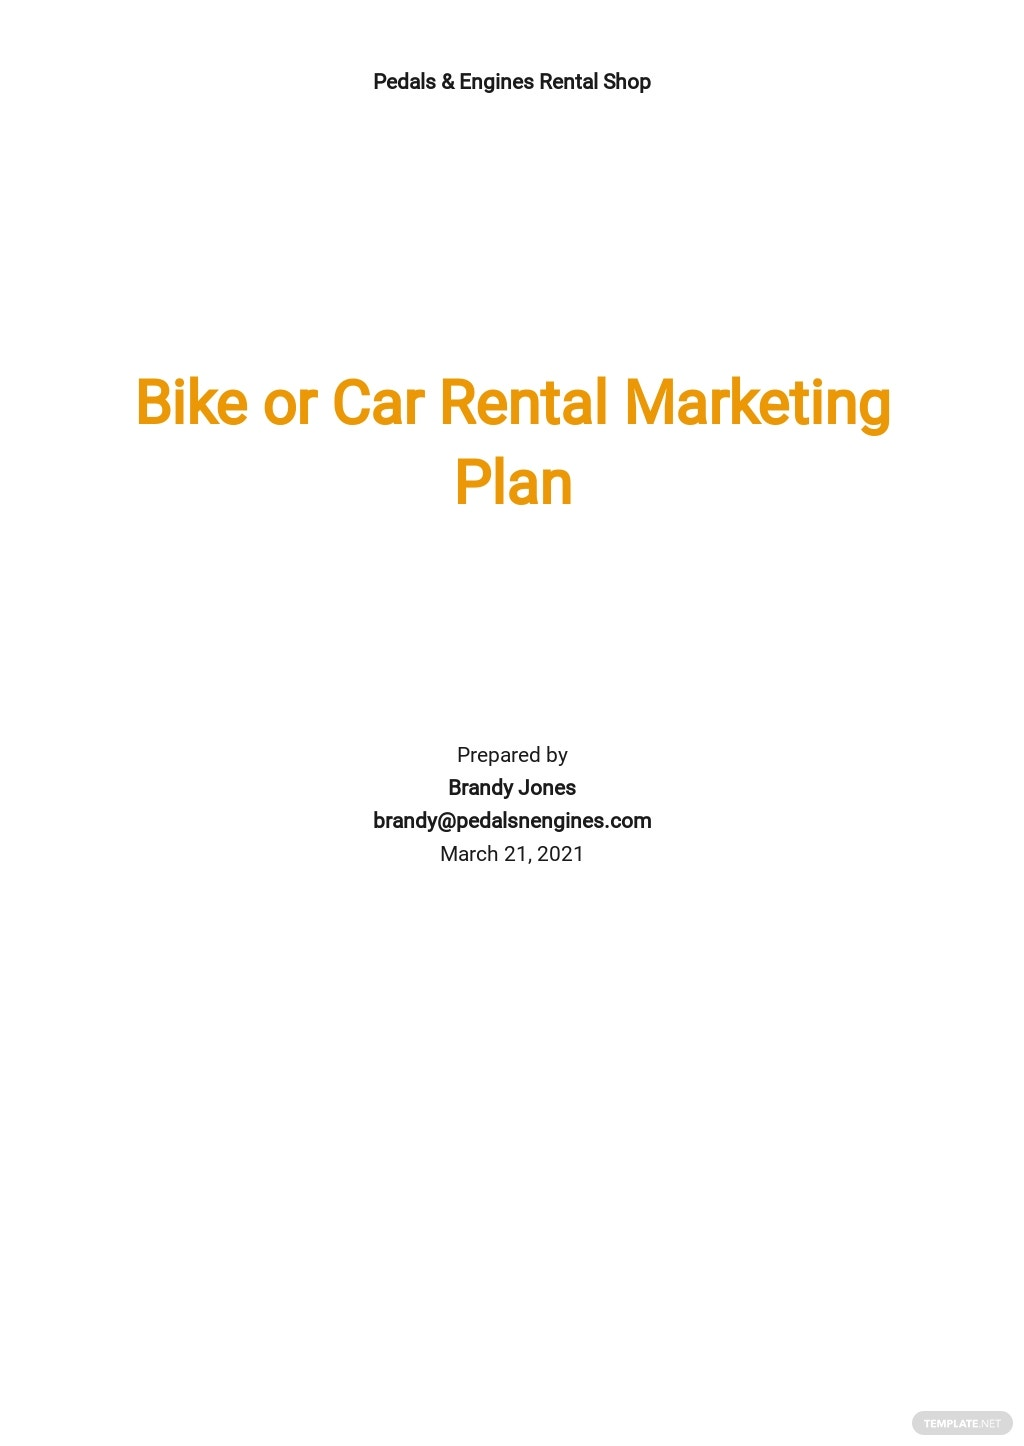 Bike or Car Rental Marketing Plan Template